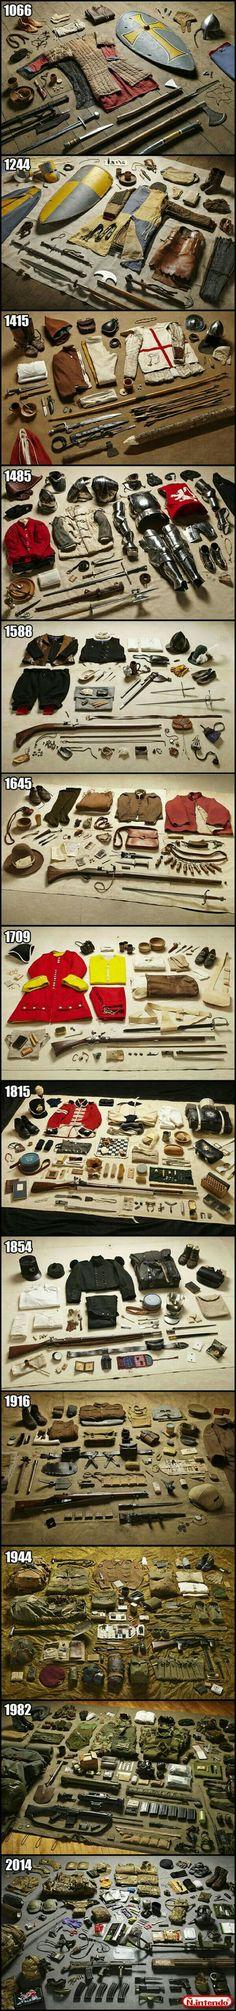 Evolution of war essentials. - 9GAG